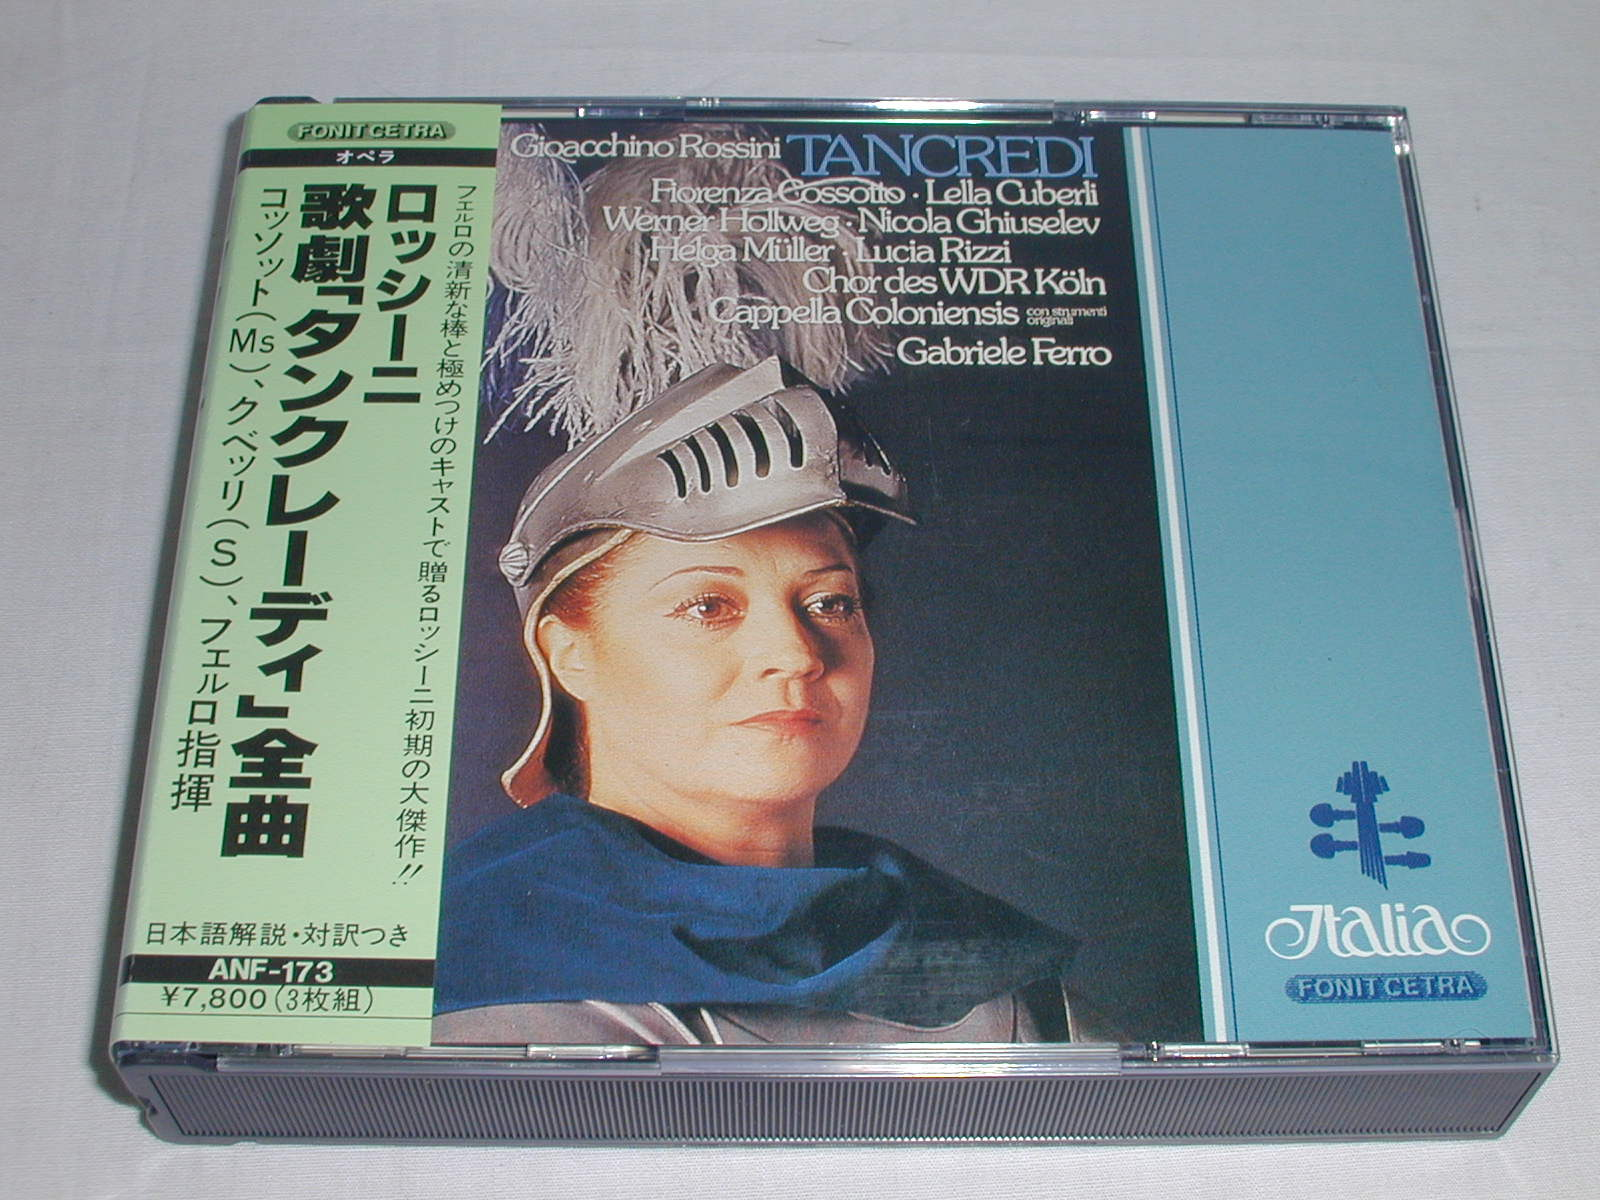 (CD) ロッシーニ:歌劇「タンクレーディ」 全曲/コッソット、クベッリ、フェルロ <3枚組>